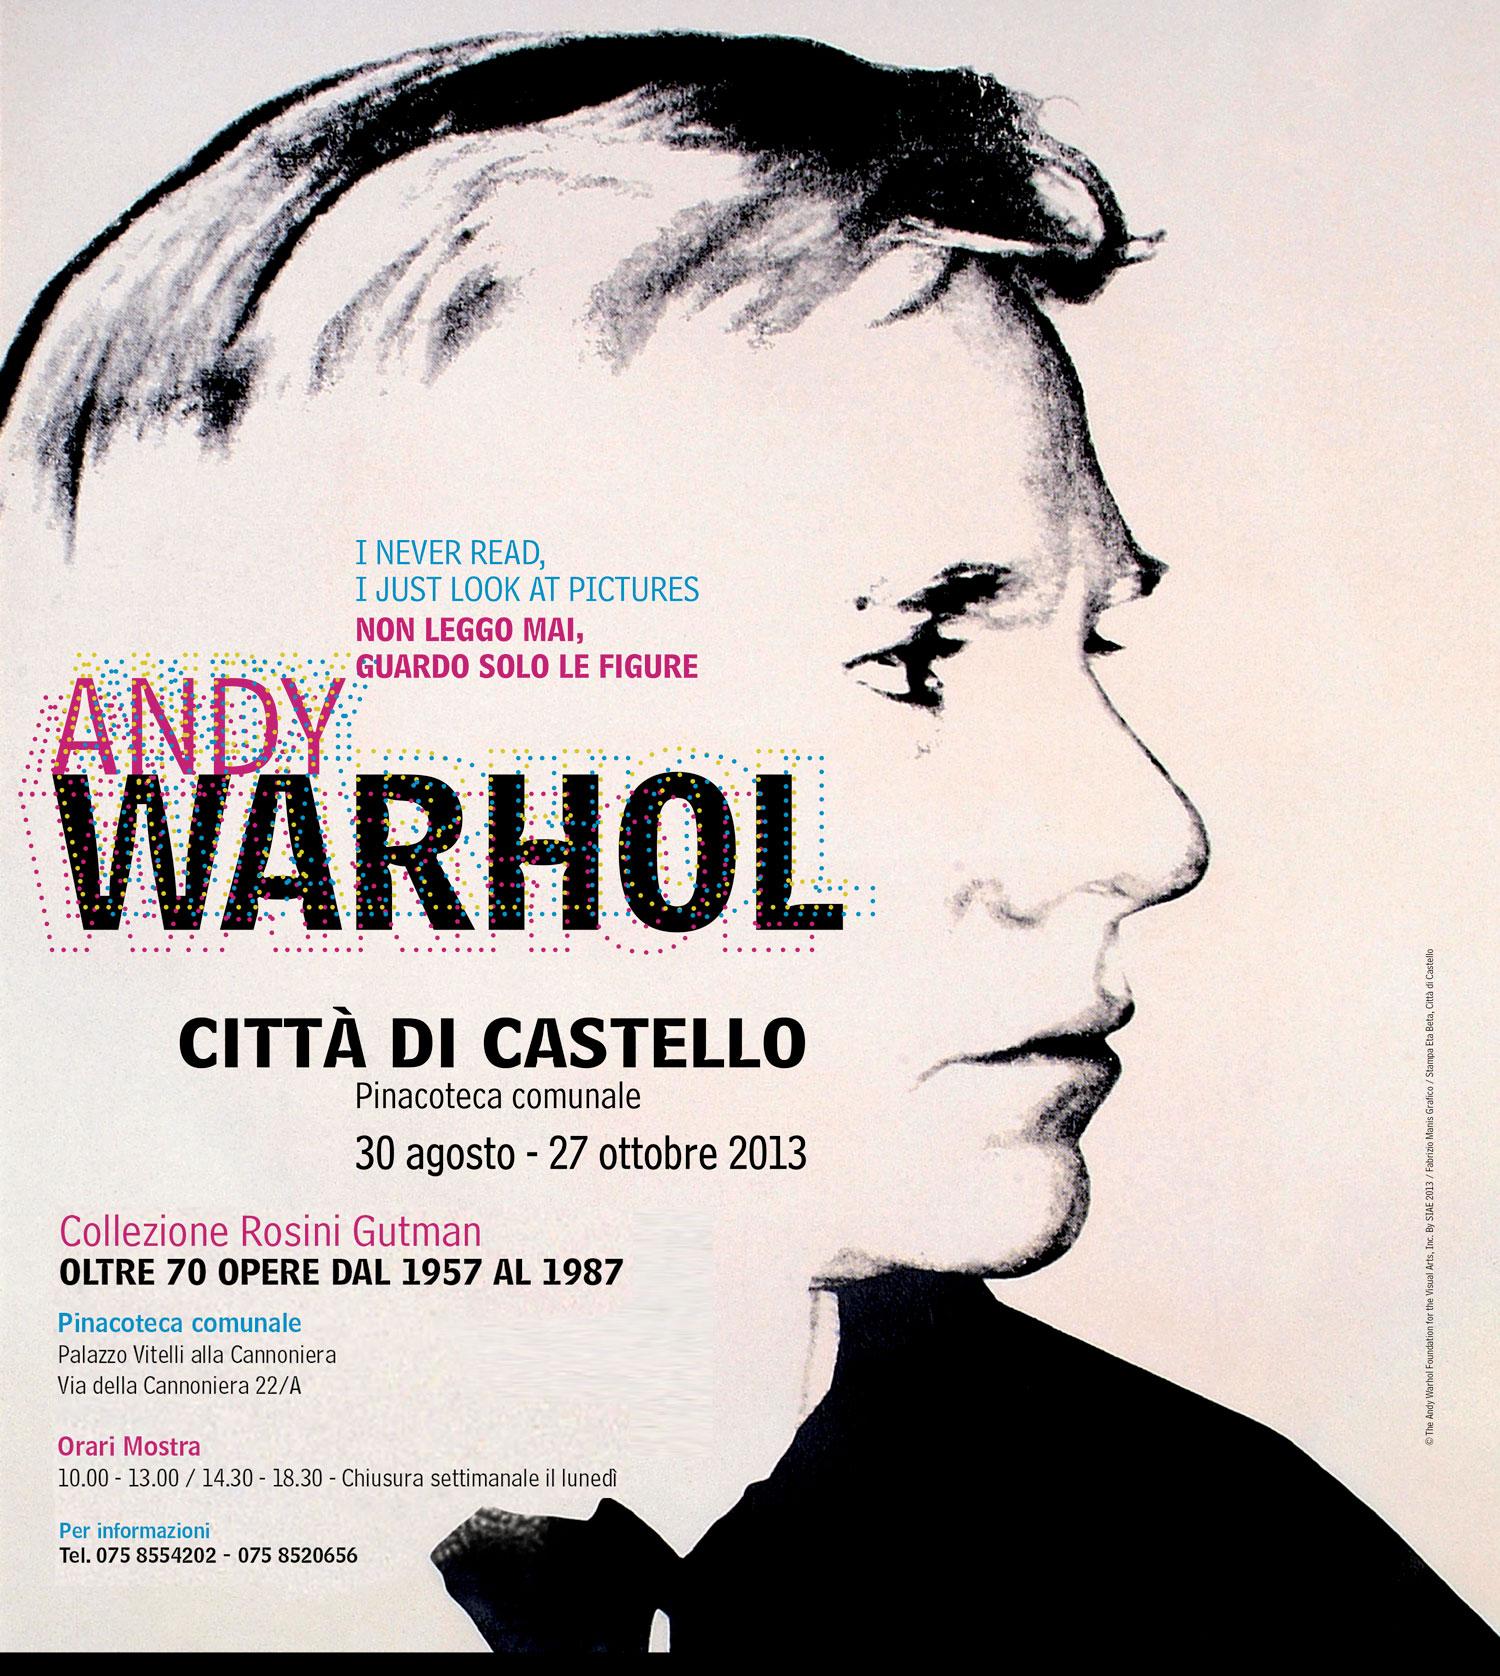 Poster-Andy-Warhol-grande2